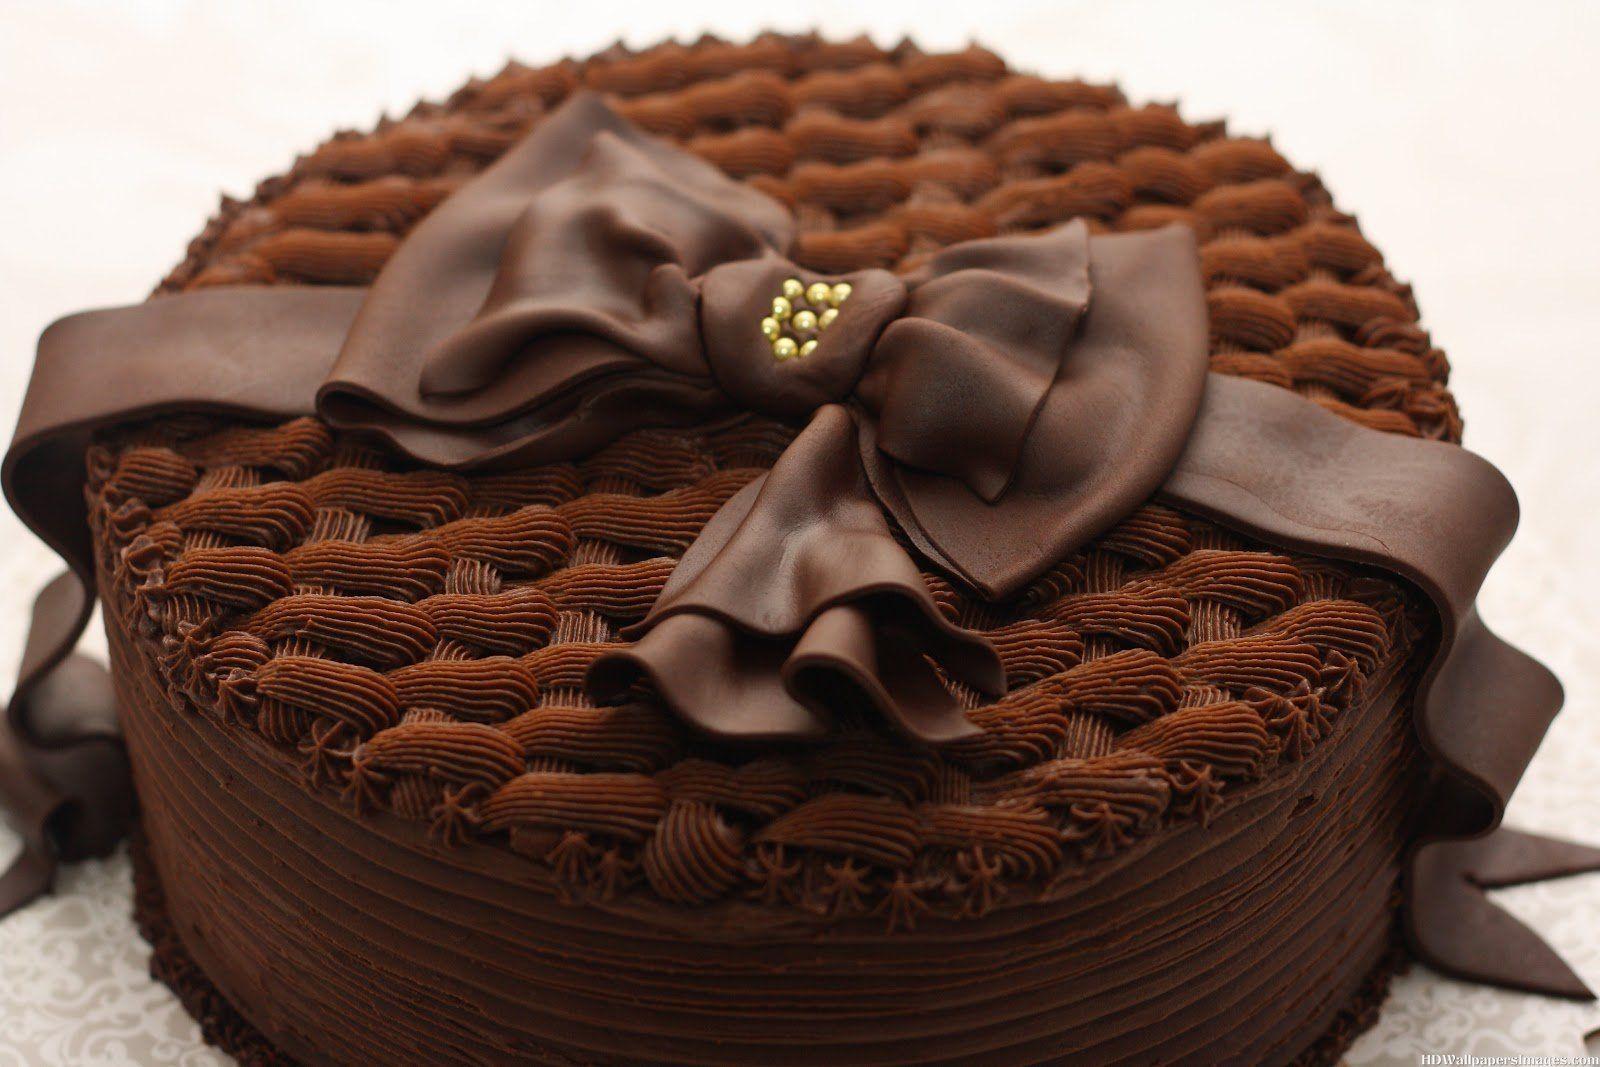 12 Chocolate Happy Birthday Beautiful Cakes Photo Chocolate